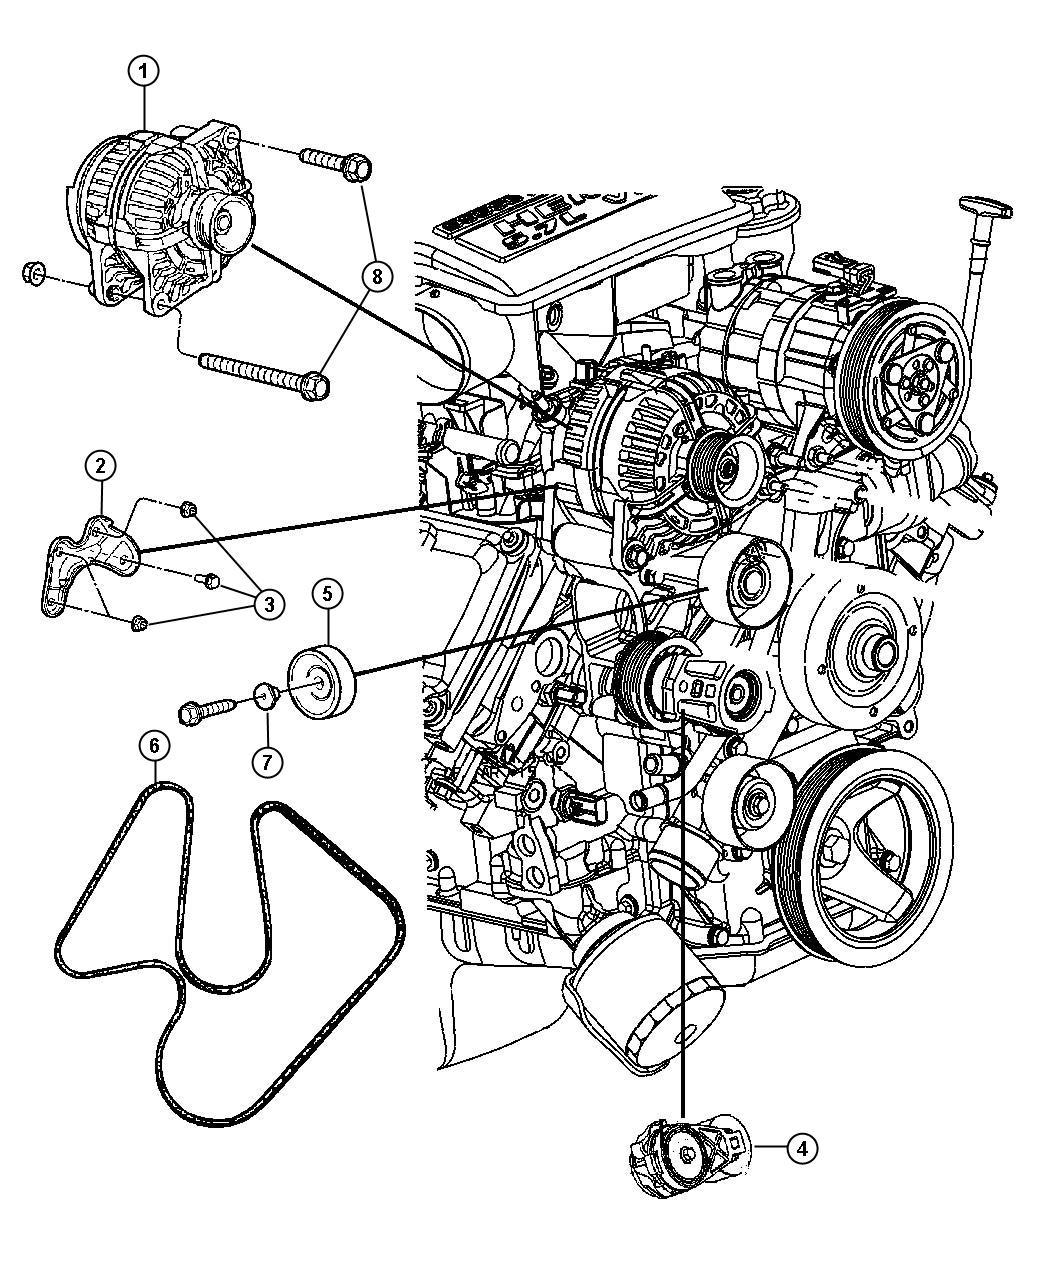 Dodge Ram 2500 Belt. Serpentine. Belts, engine, alternator